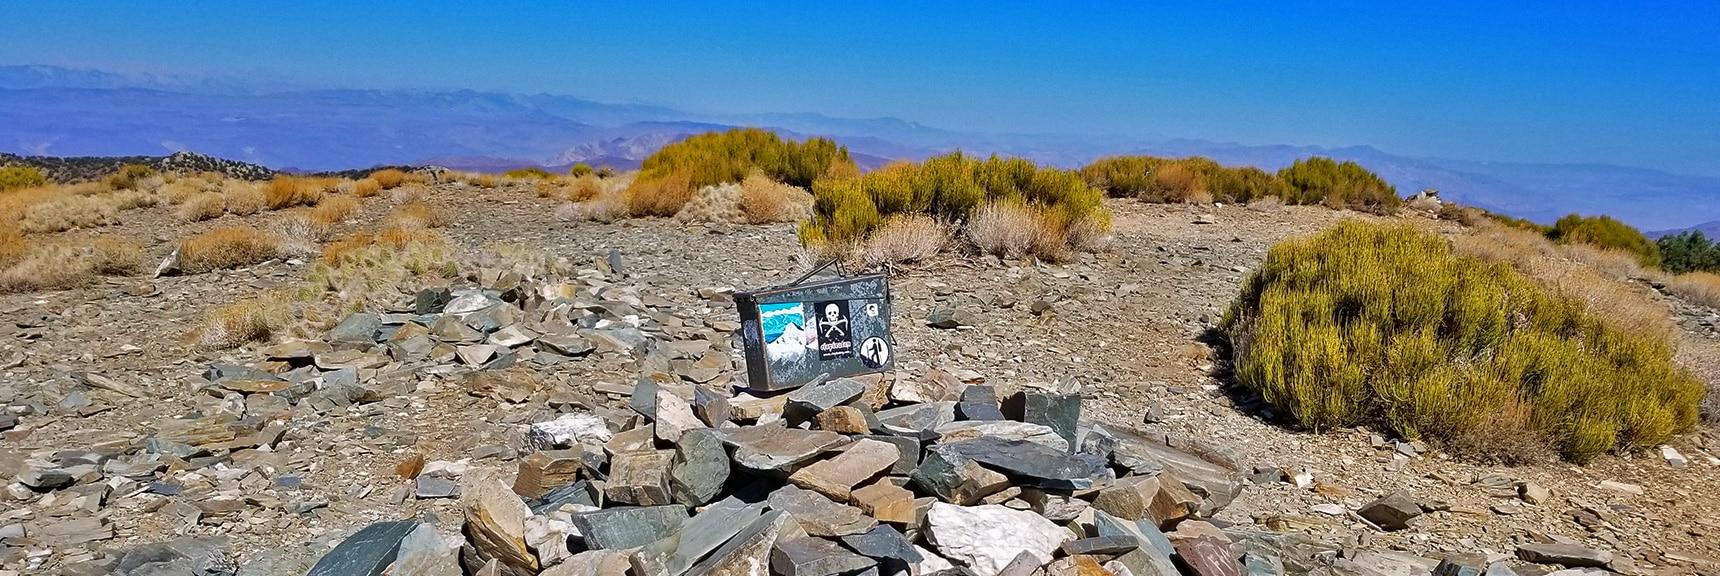 Arrival on Wildrose Peak Summit   Wildrose Peak   Panamint Mountain Range   Death Valley National Park, California